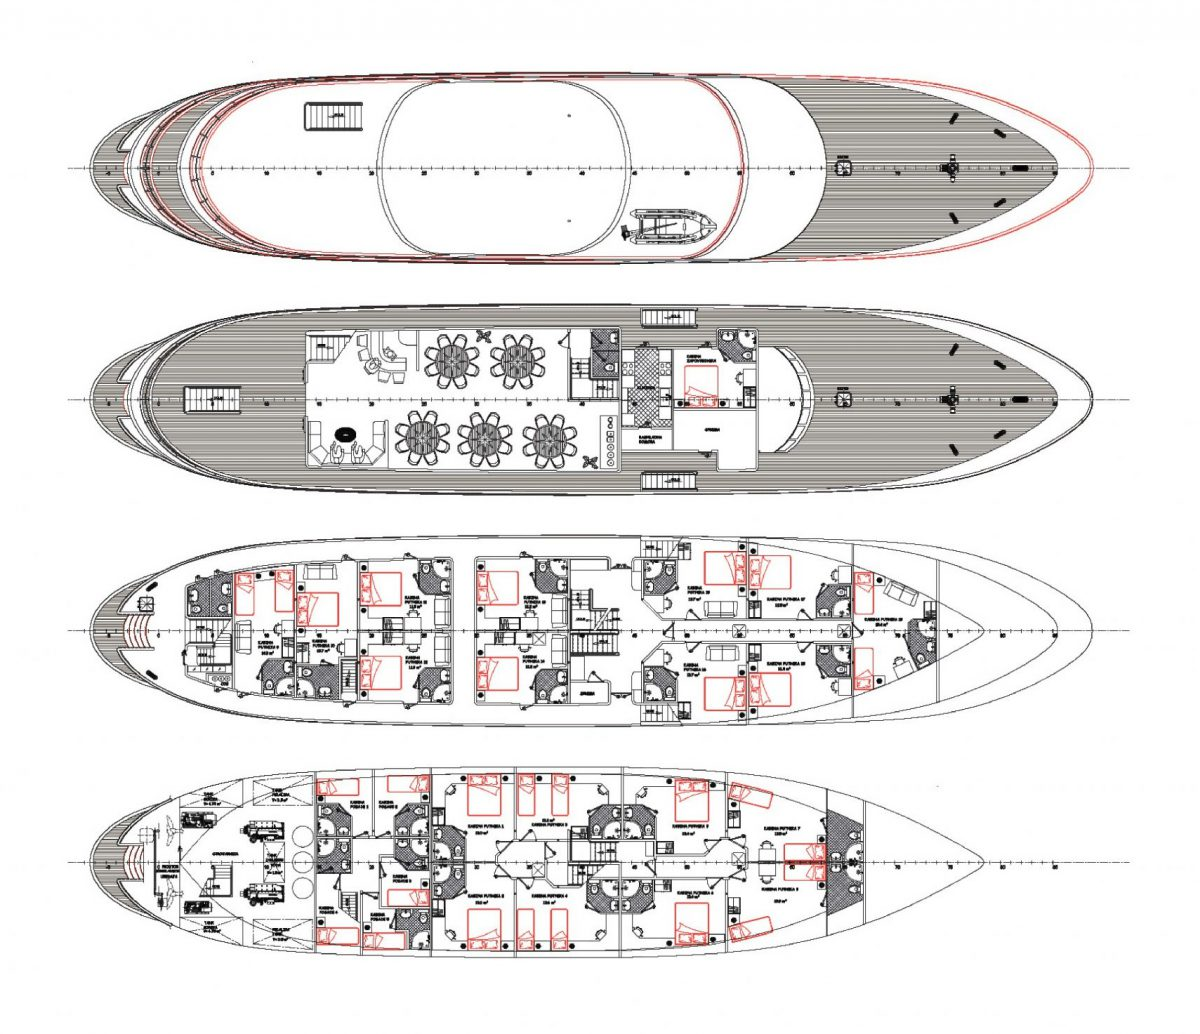 MS Futura Deck Plan